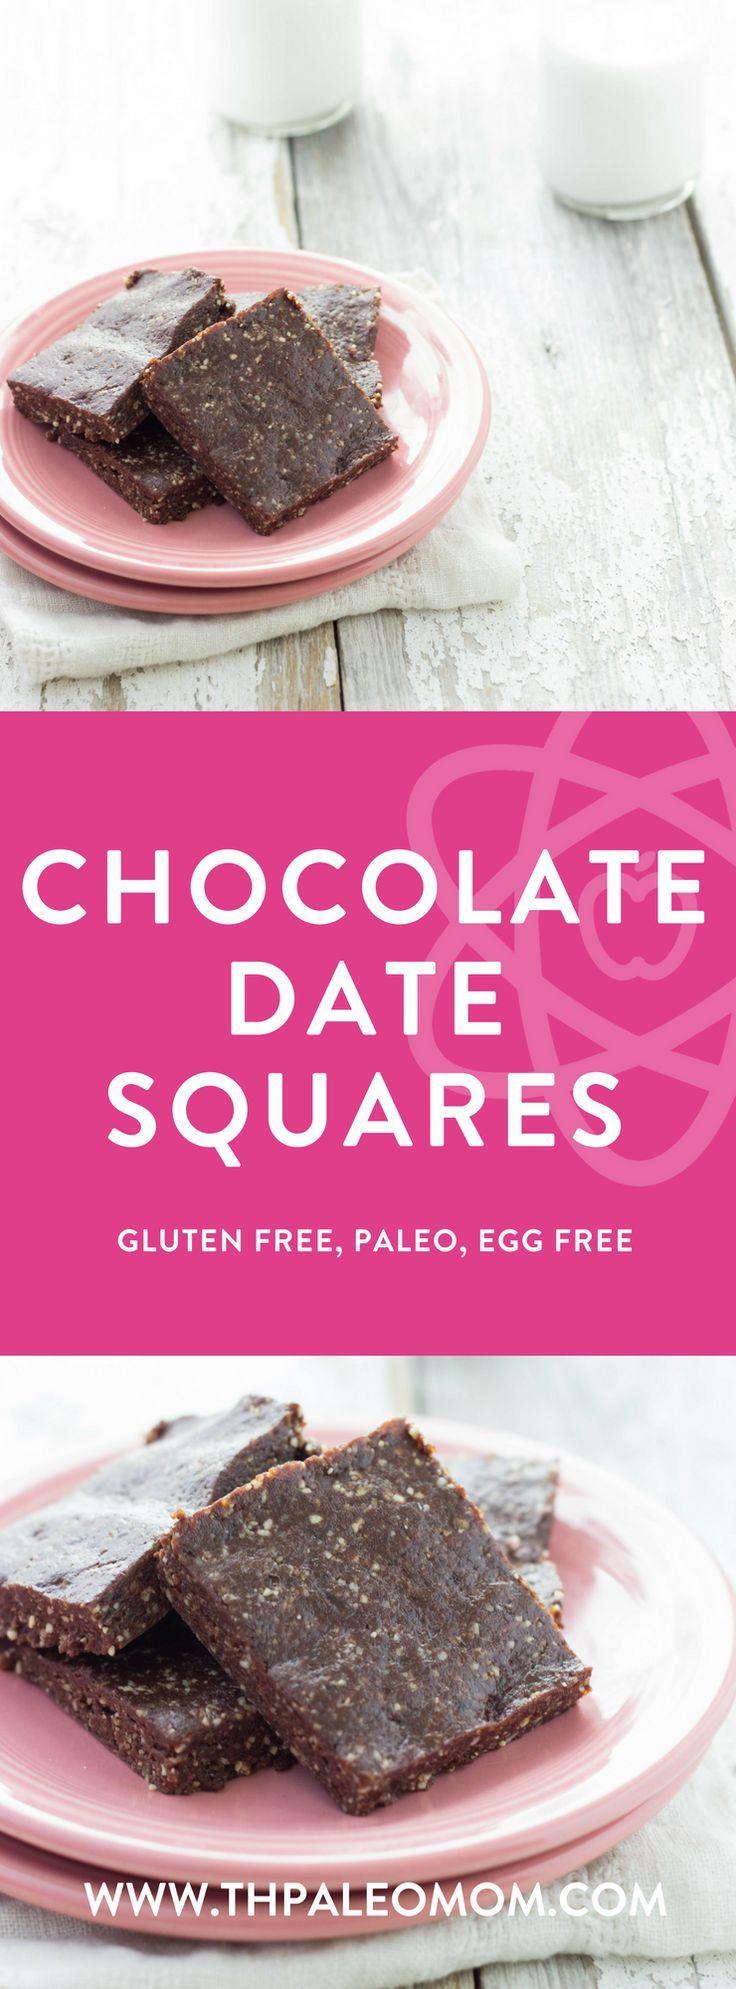 Chocolate Date Squares   The Paleo Mom